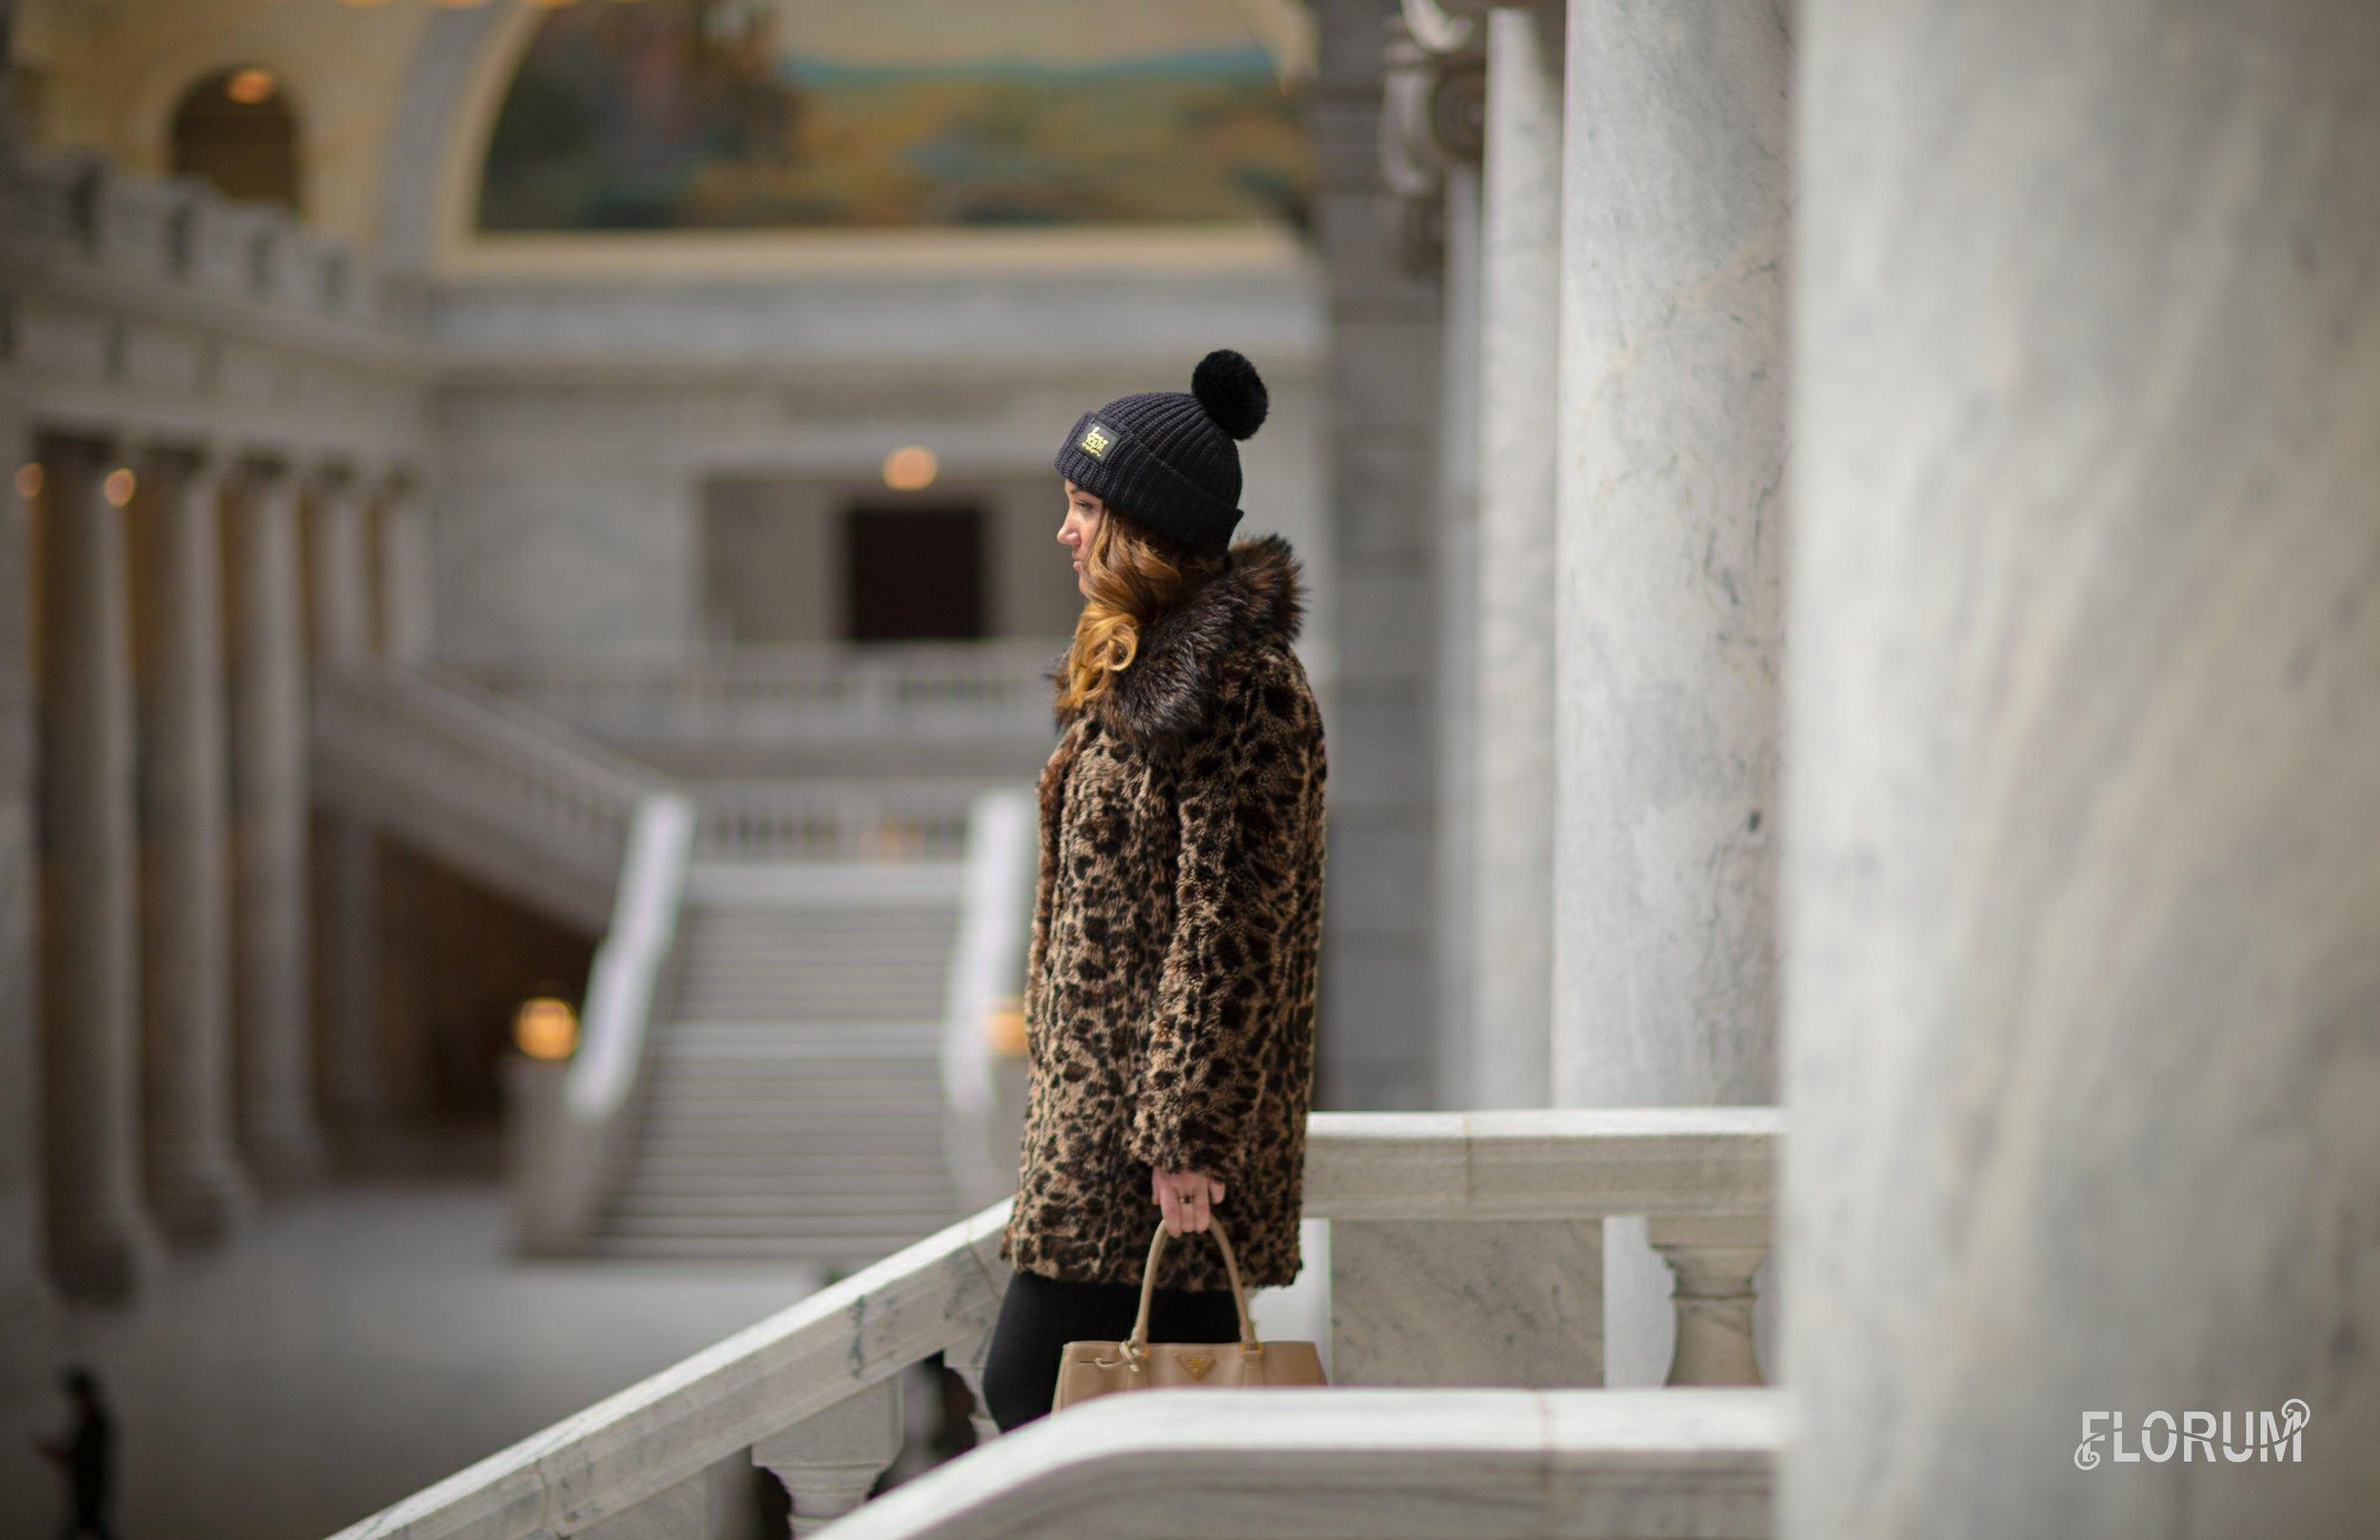 Salt Lake City - Hotel Monaco - Florum Fashion Magazine - Bobby Swingler - Ethical winter fashion - eco travel - noelle lynne06.jpg